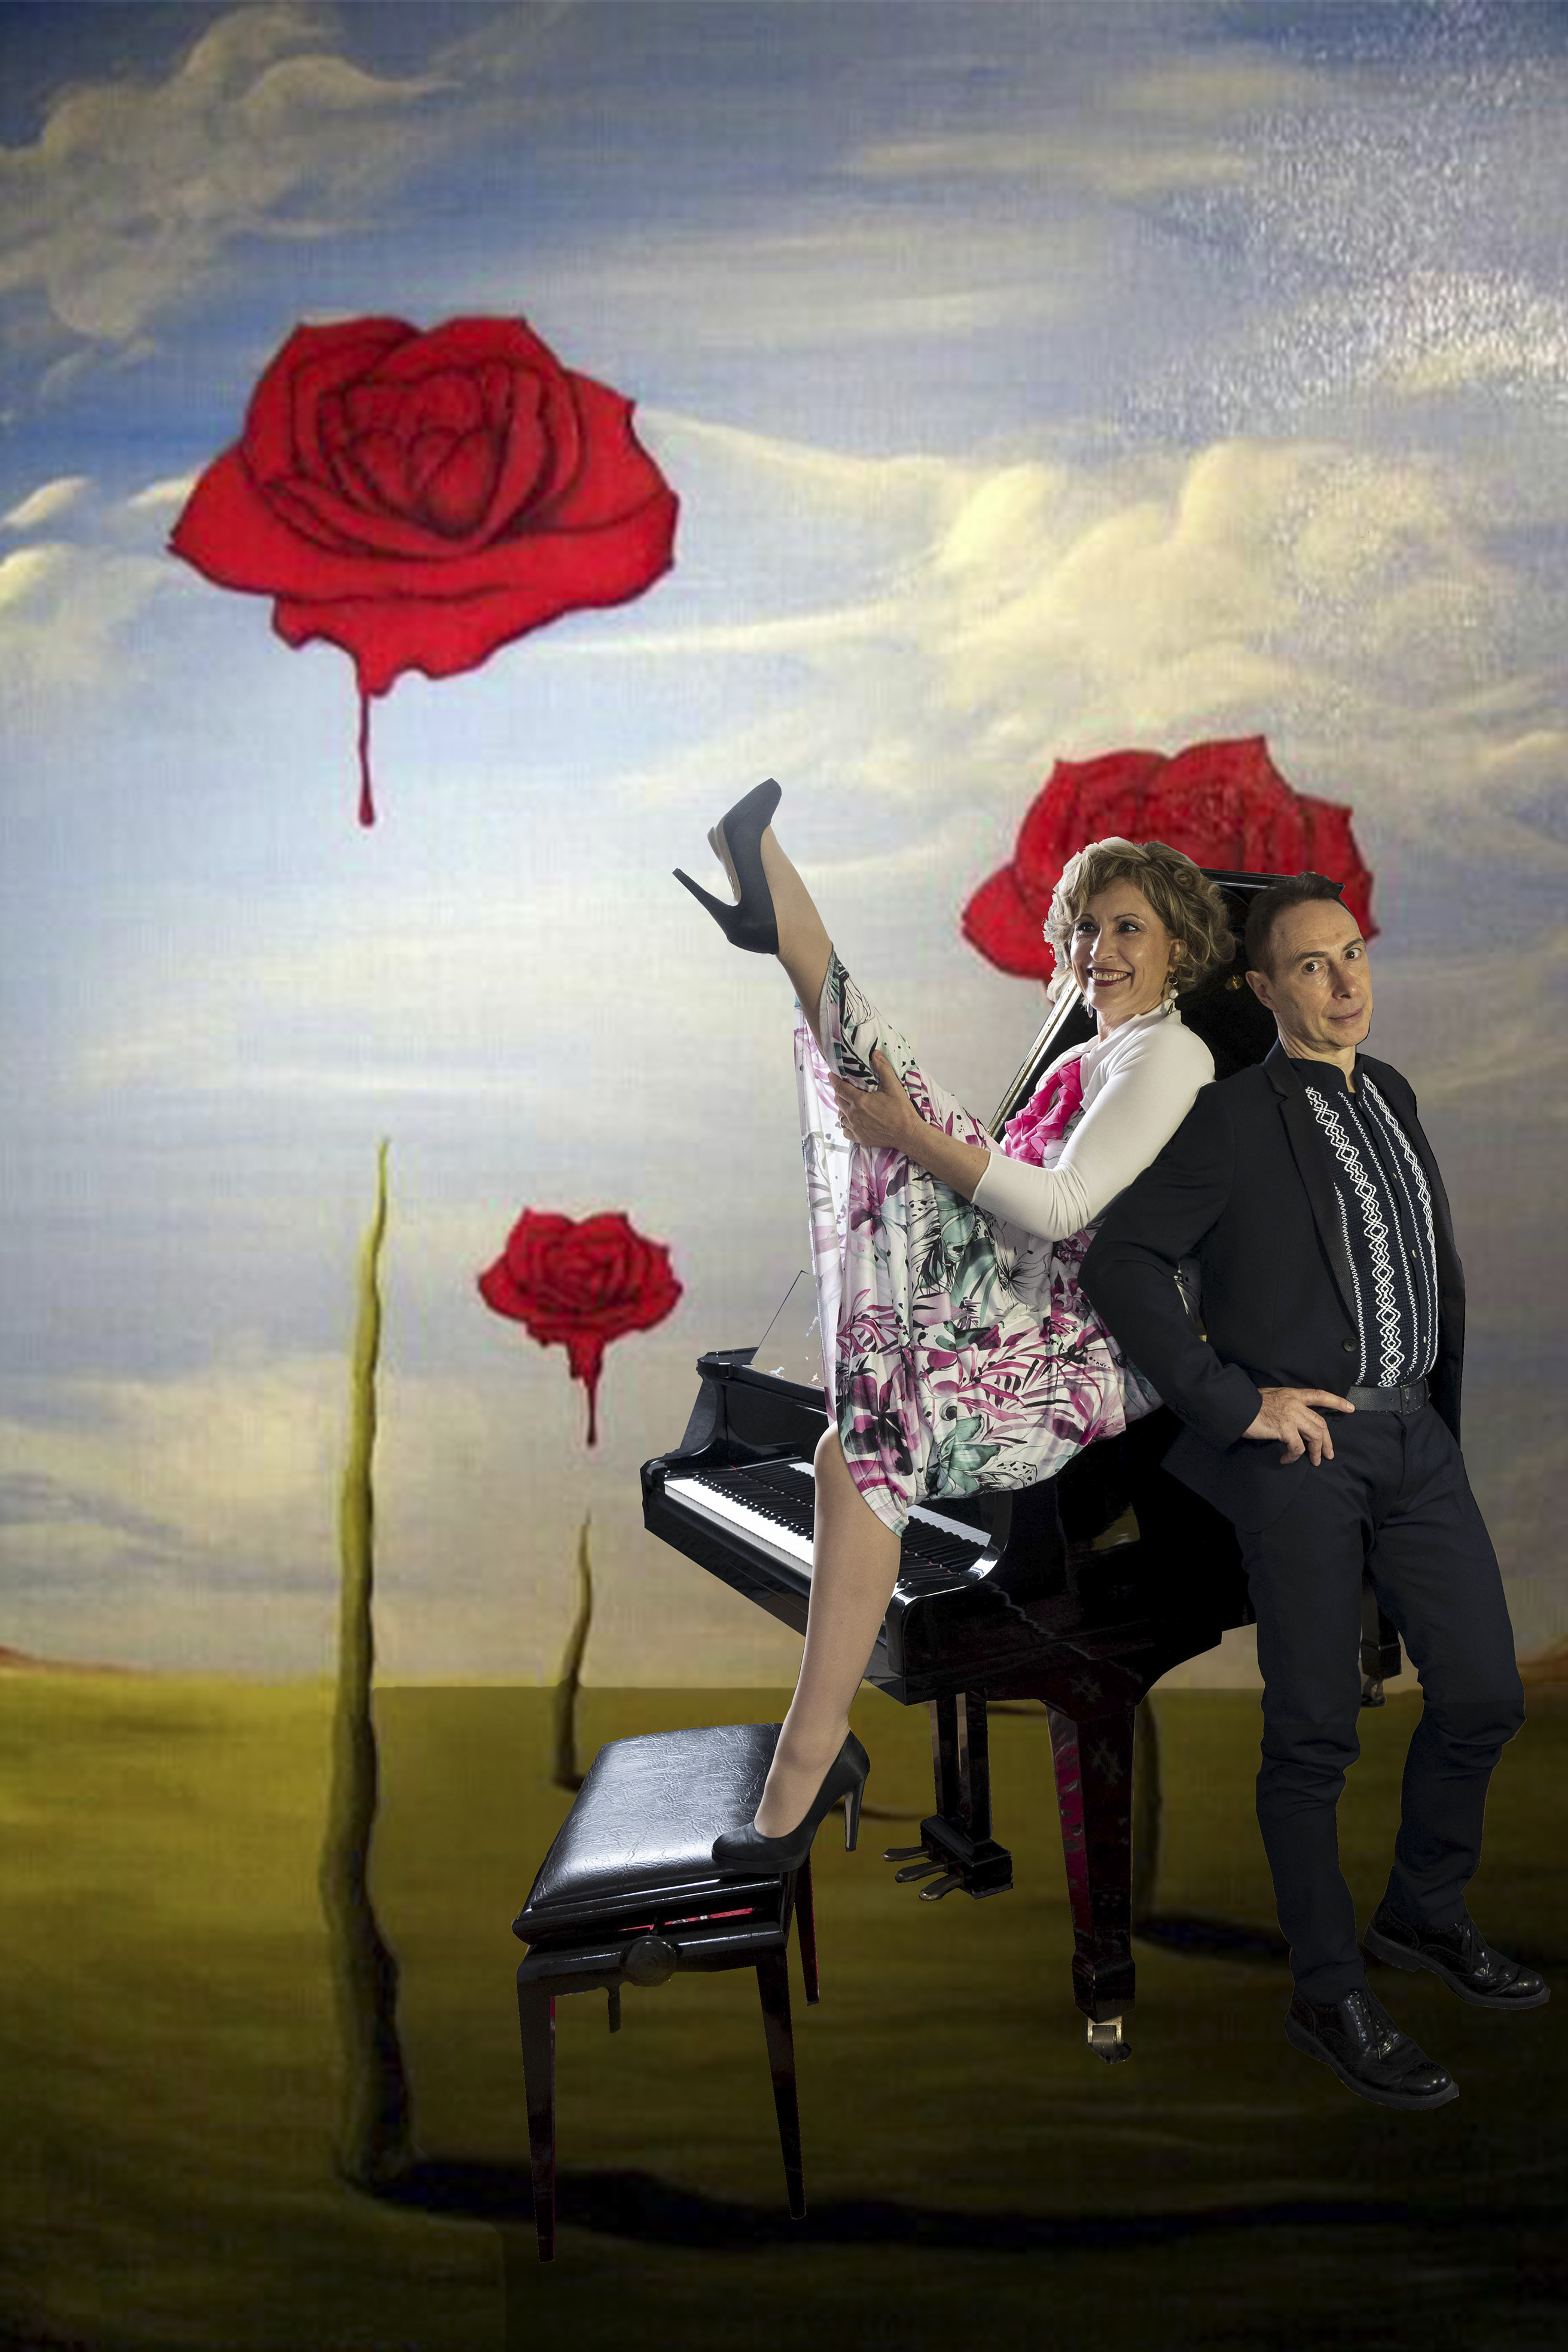 Duo Alterno con fiori rossi _ mediumres